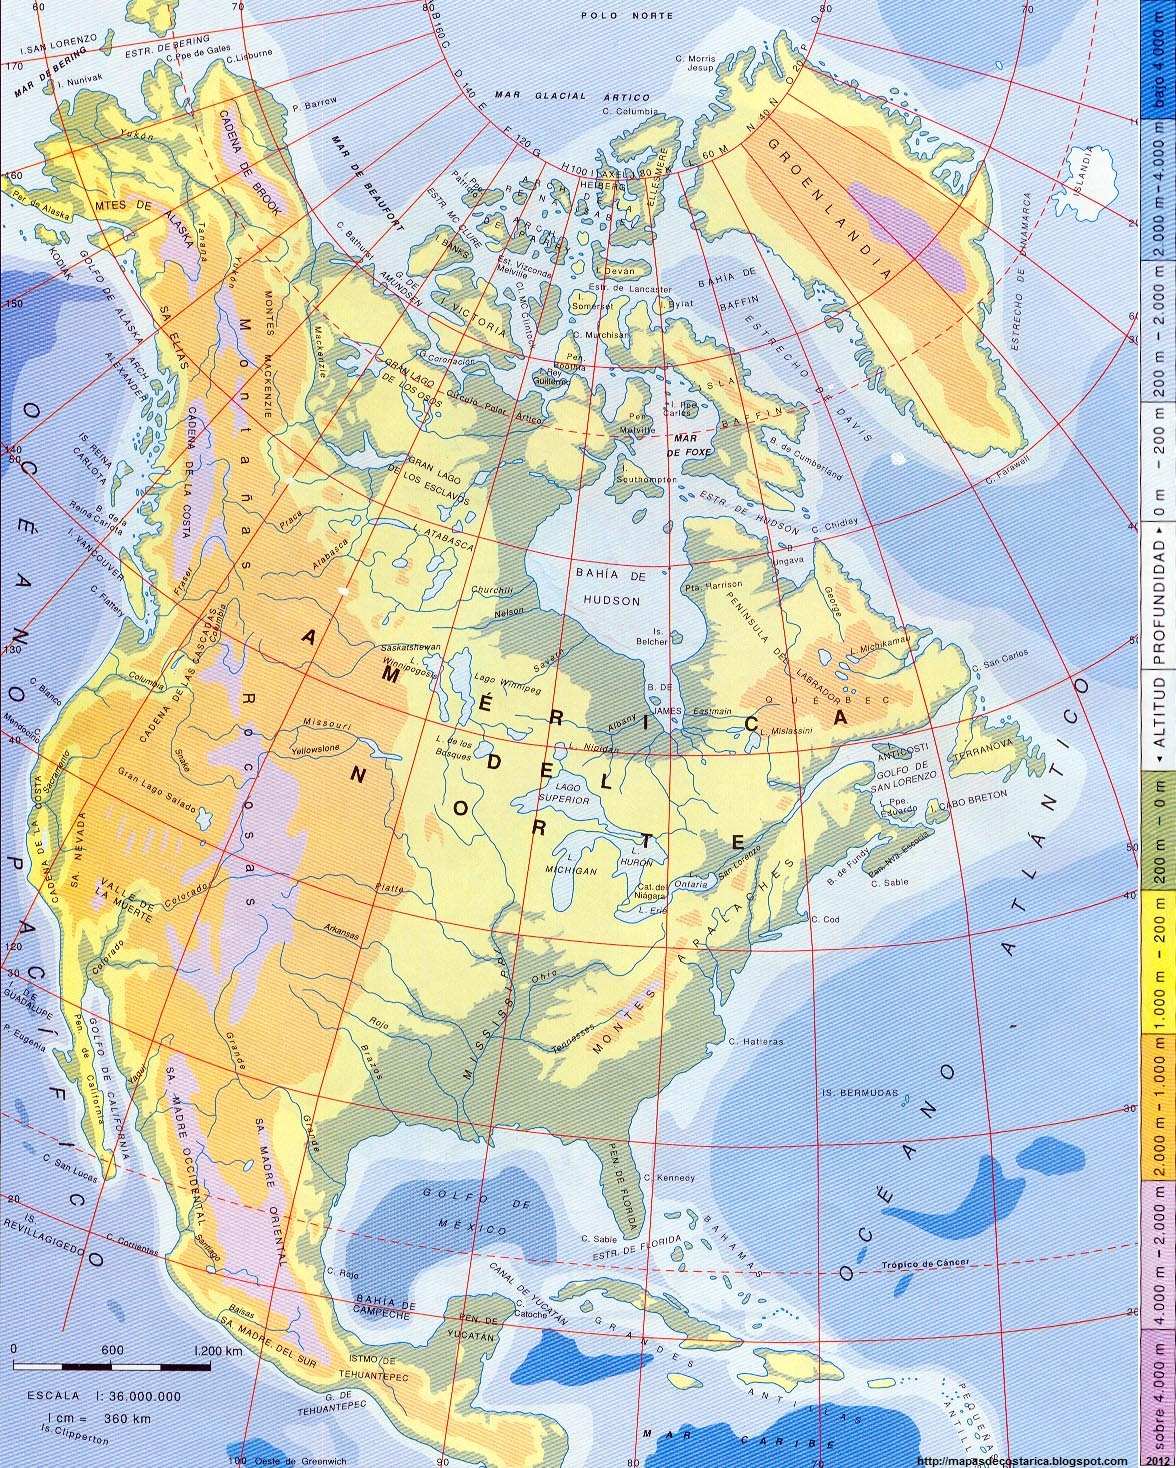 Mapa Orografico De America Del Norte